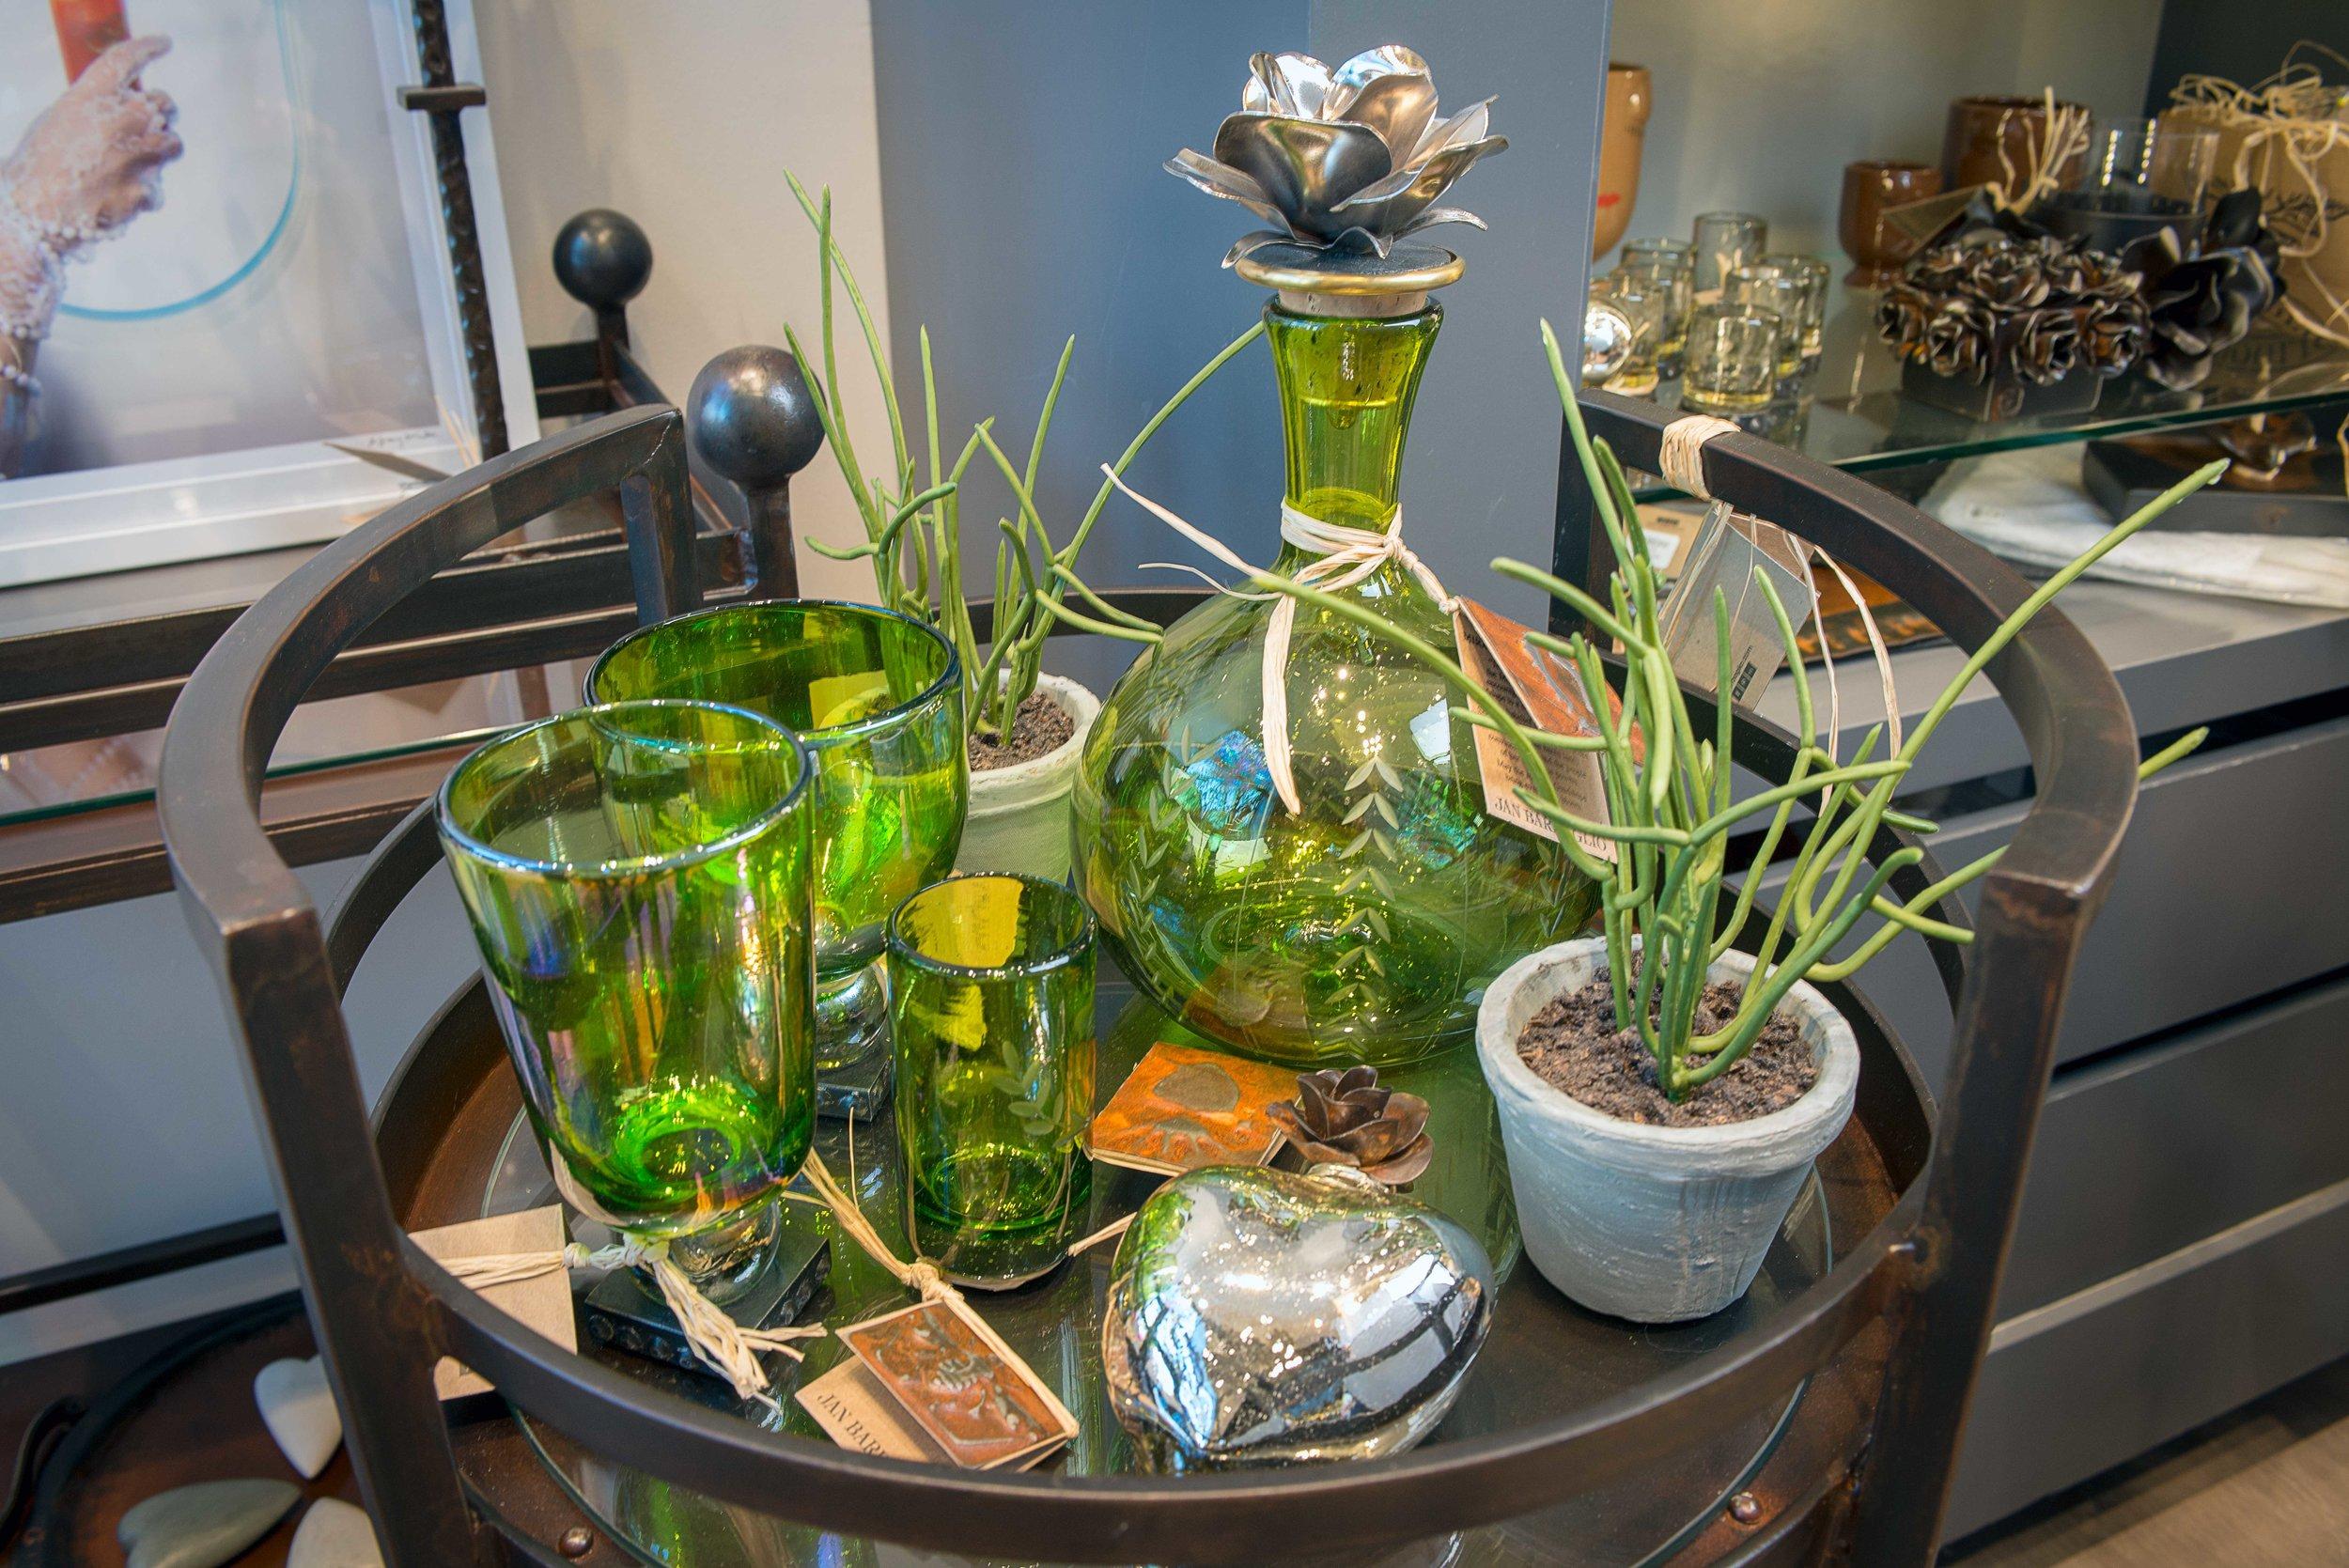 bachman-hand-smwe-green-glassware.jpg